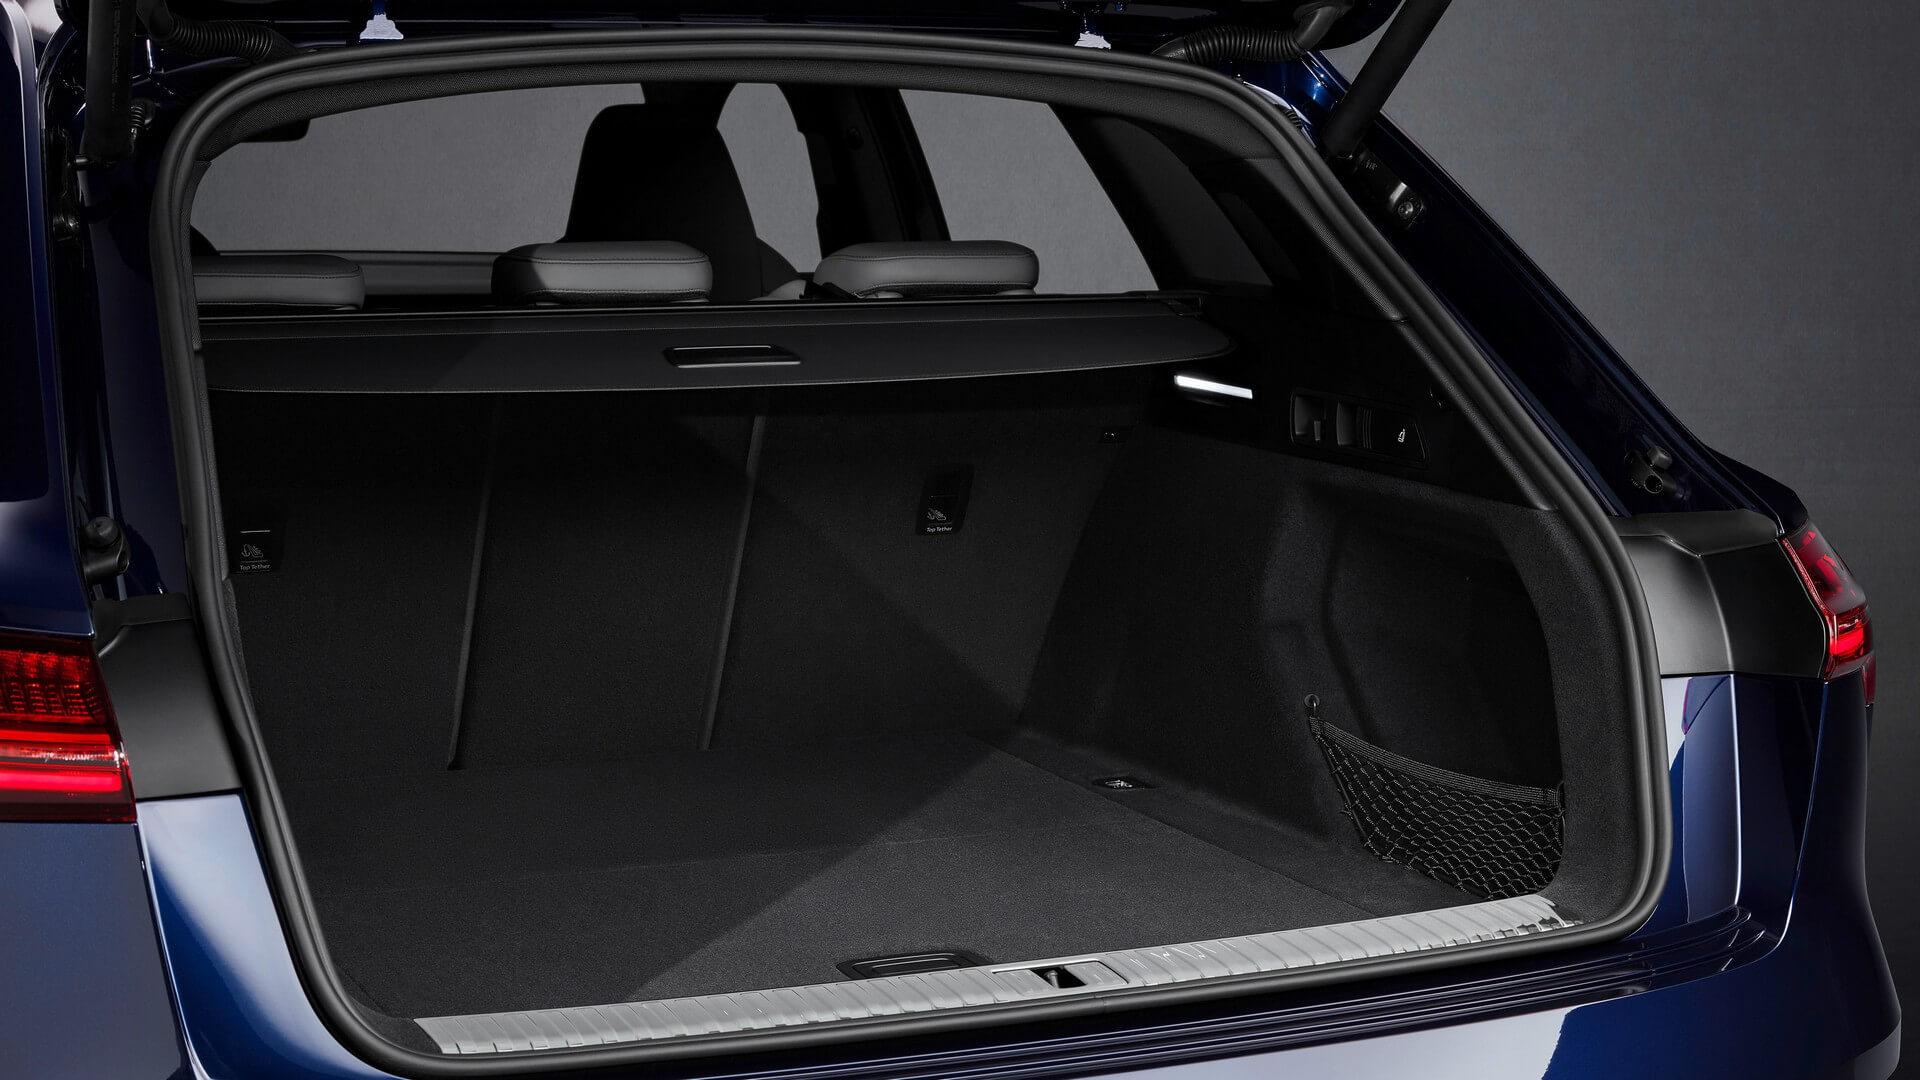 Audi-E-Tron-S-and-E-Tron-S-Sportback-2020-103